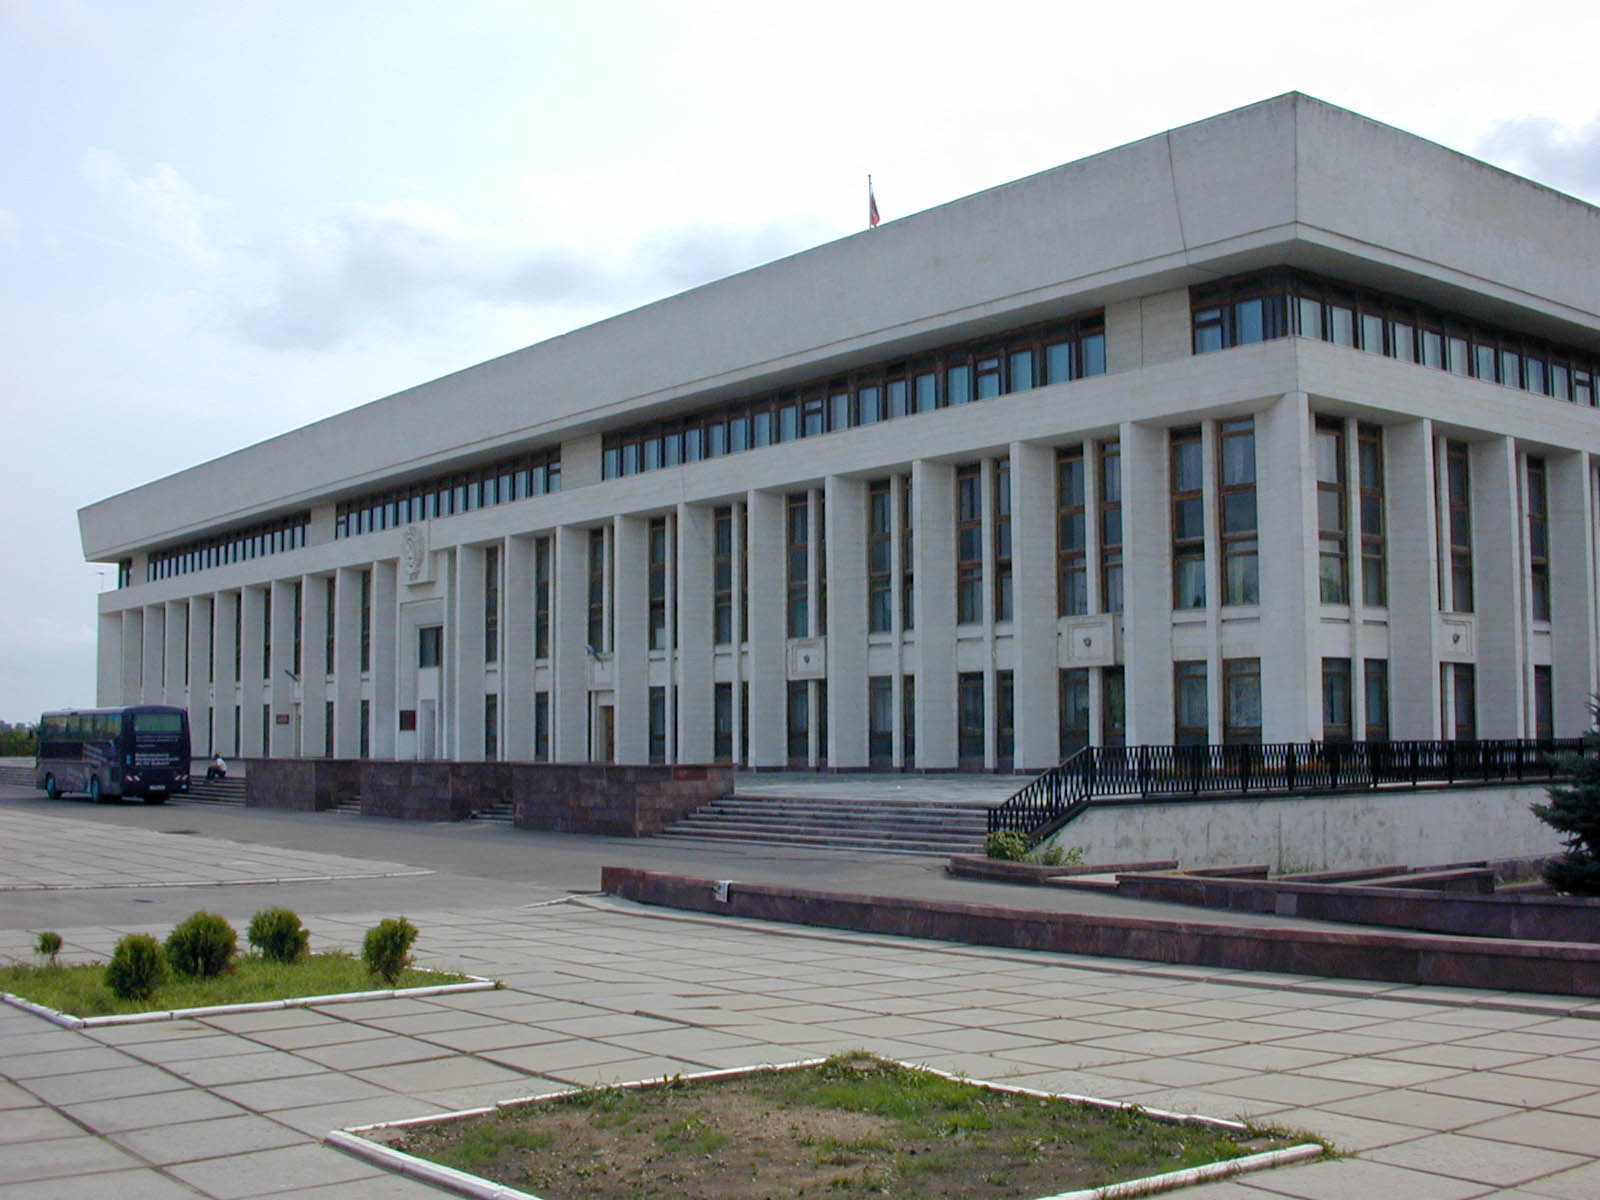 г калуга ооо электротехнический завод: